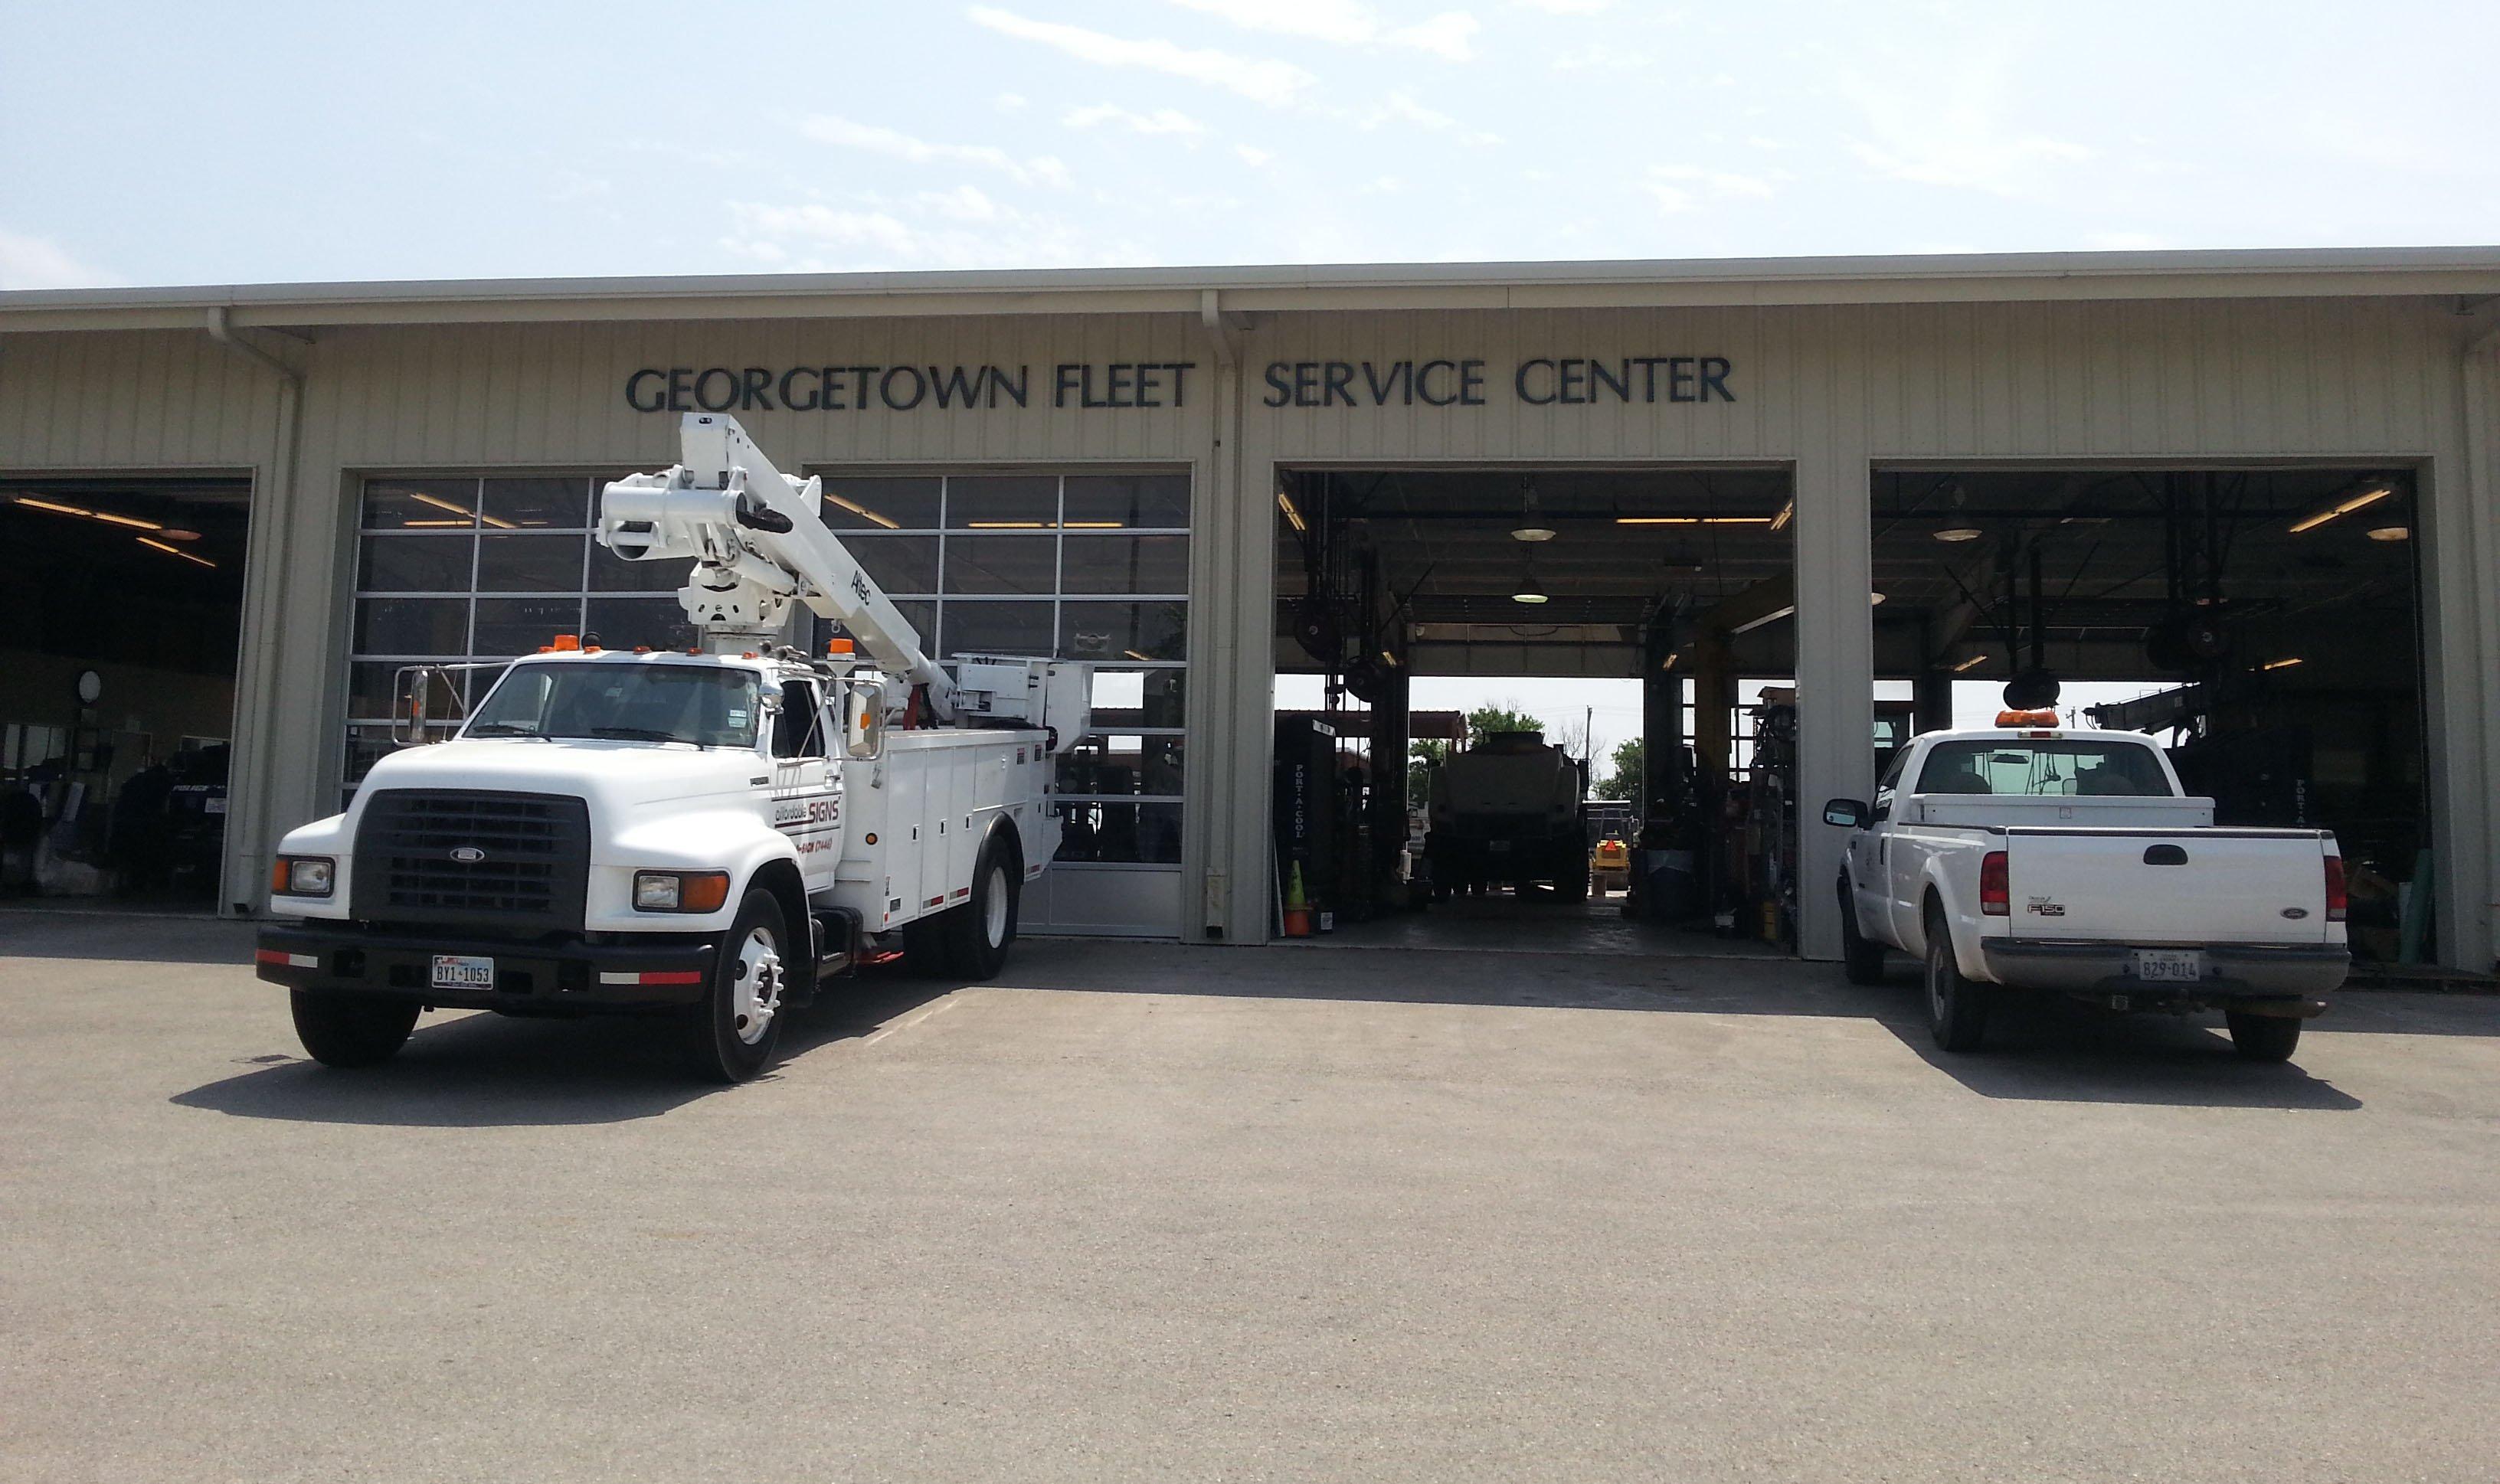 Georgetown Fleet Service Center